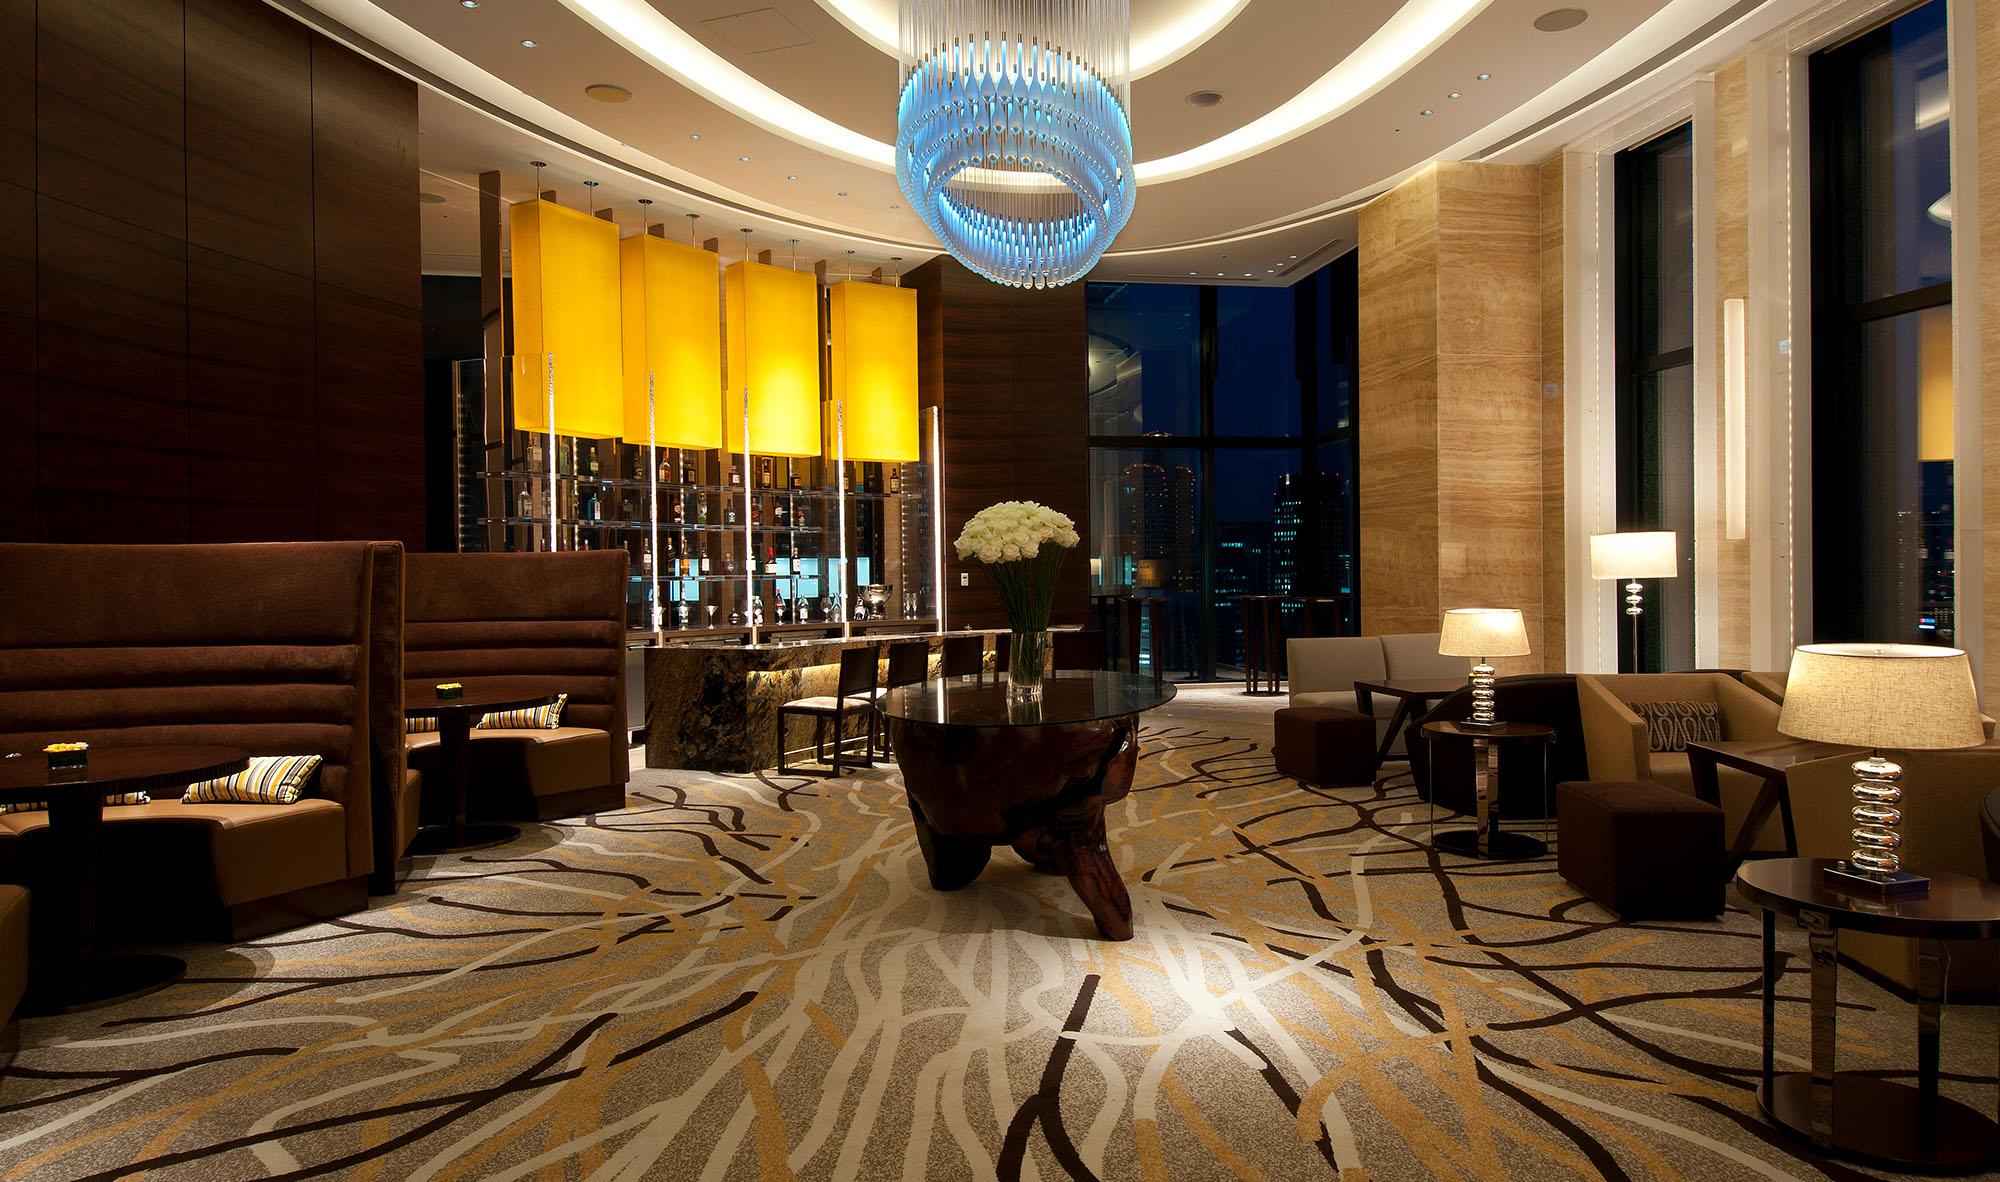 InterContinental Osaka – Bilkey LLinas Design